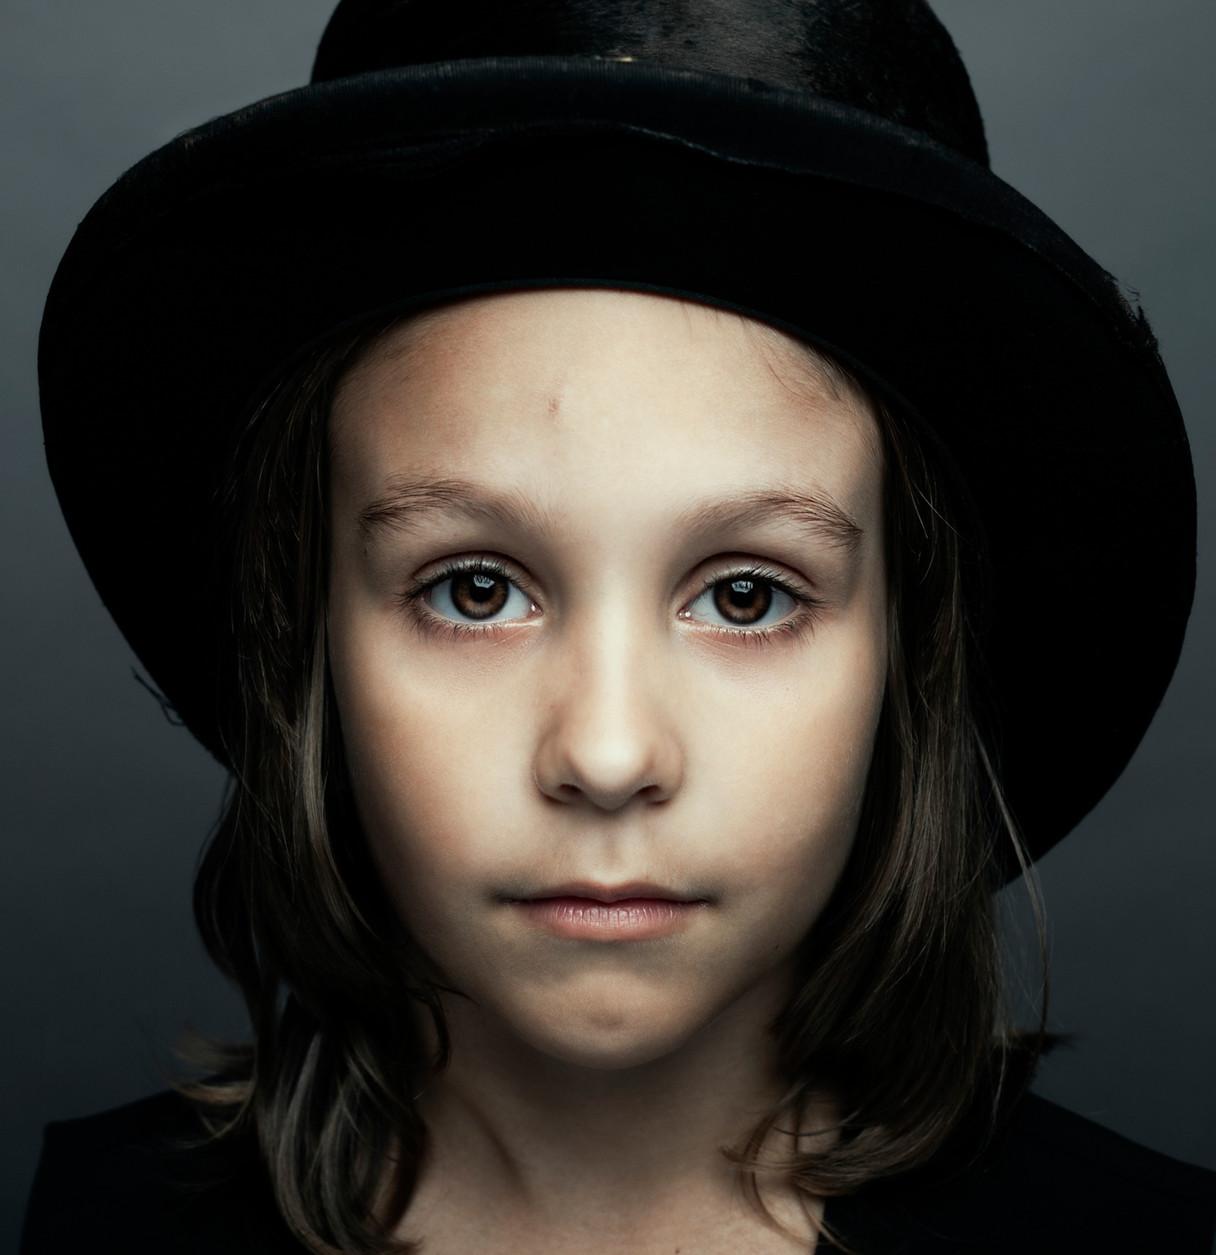 Levente Portrait Photography Berlin 13